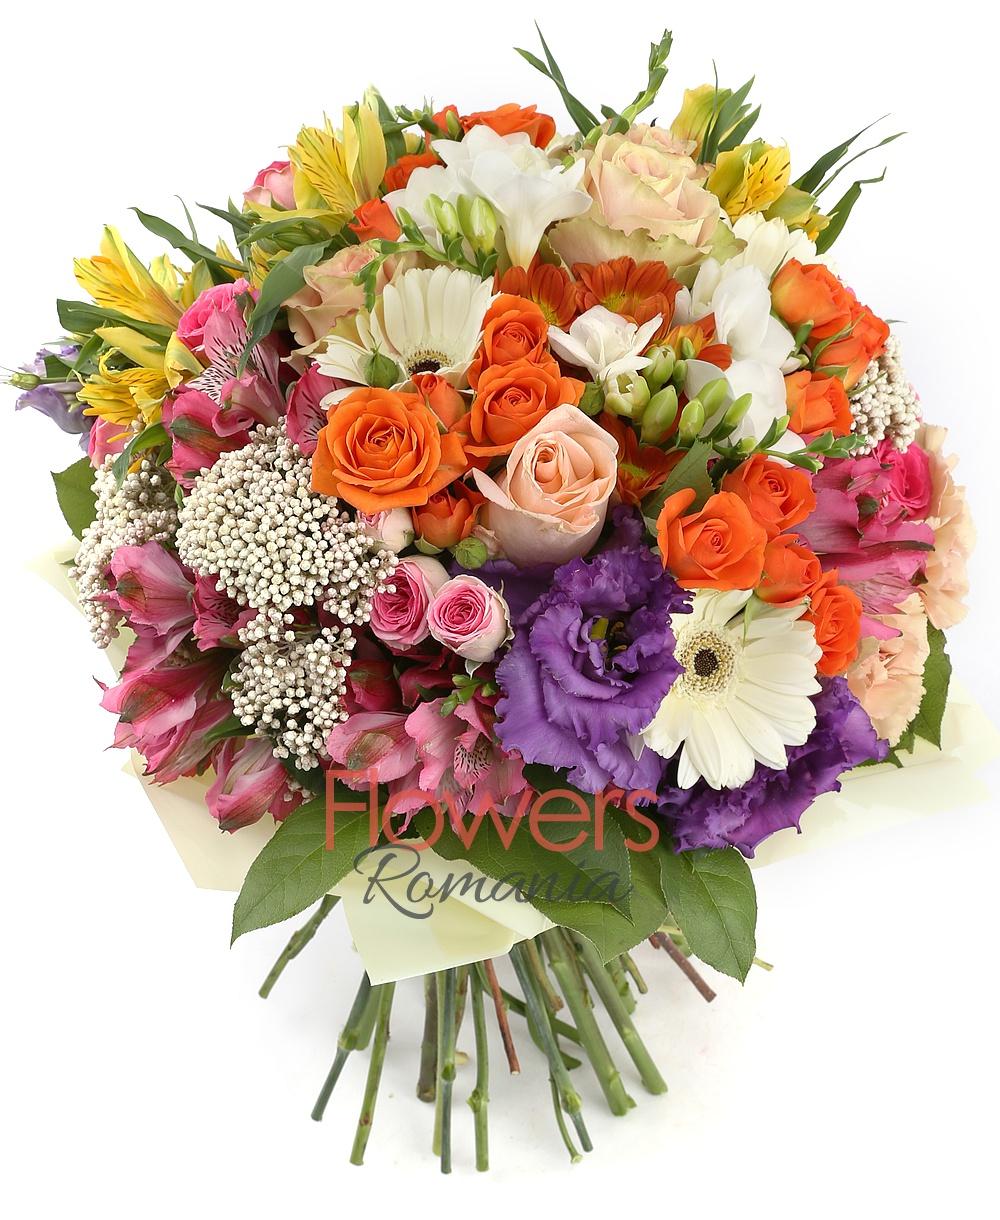 Sarabande of flowers